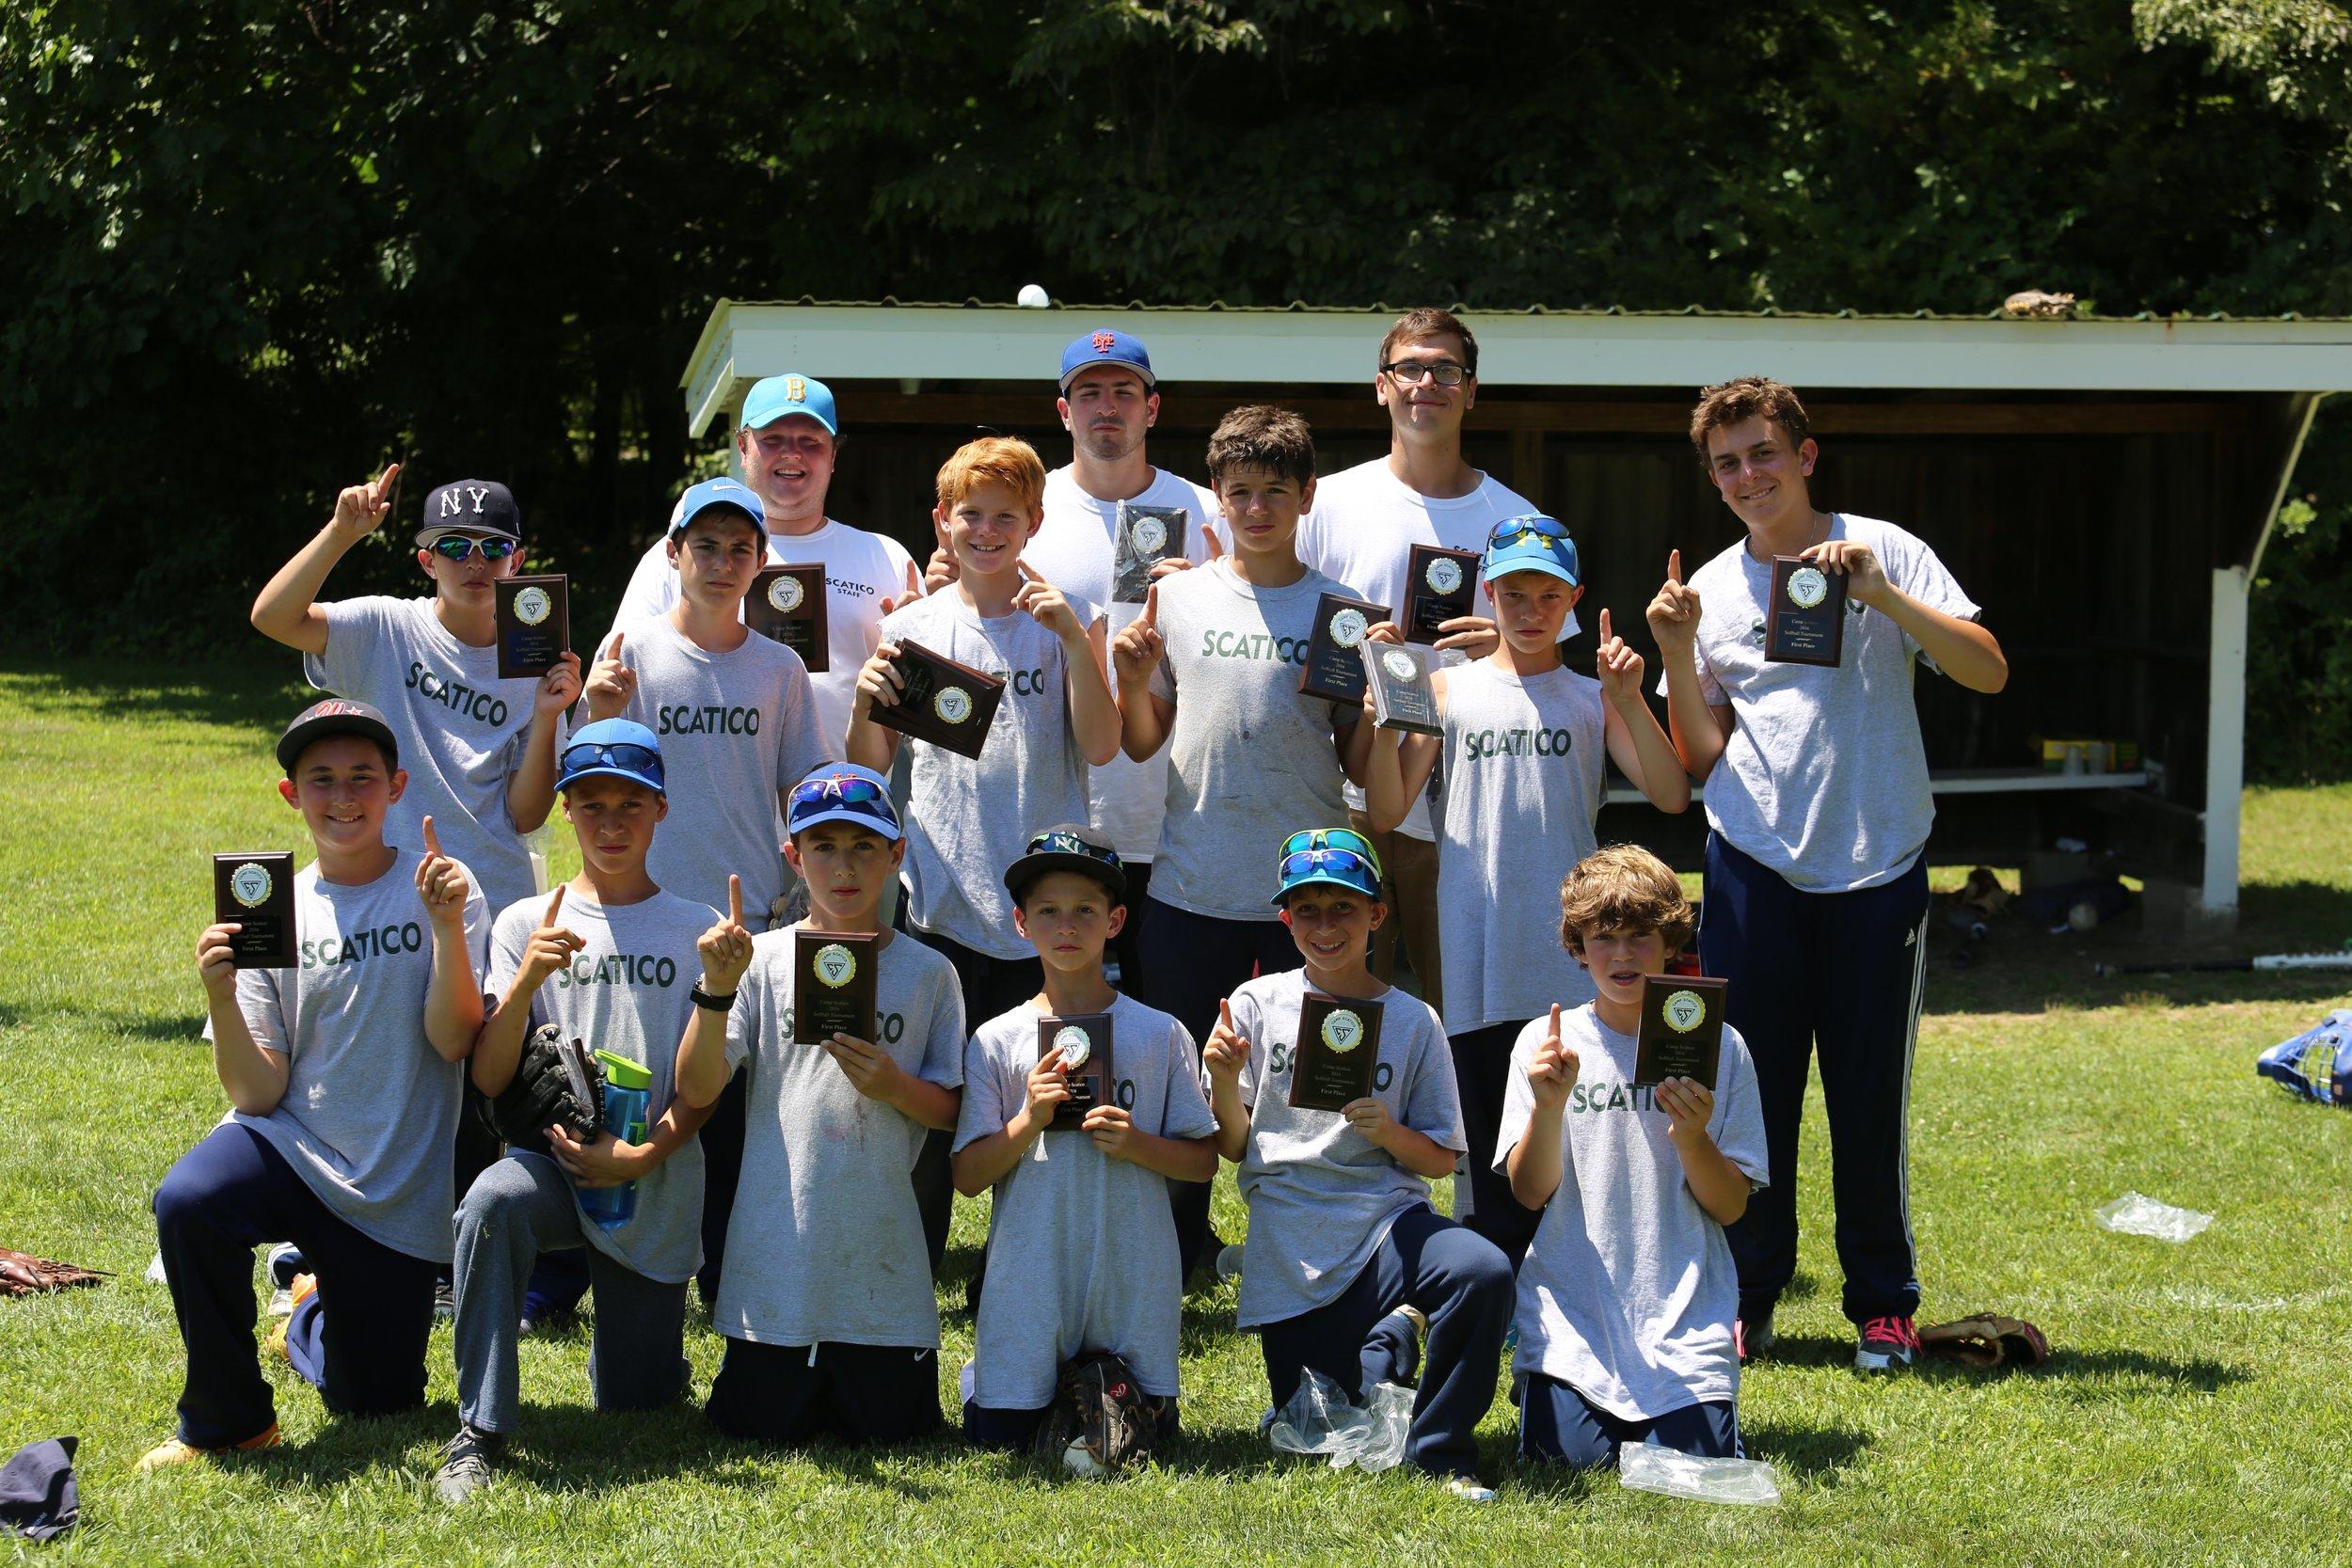 Scatico's winning under-13 1/2 tournament softball team